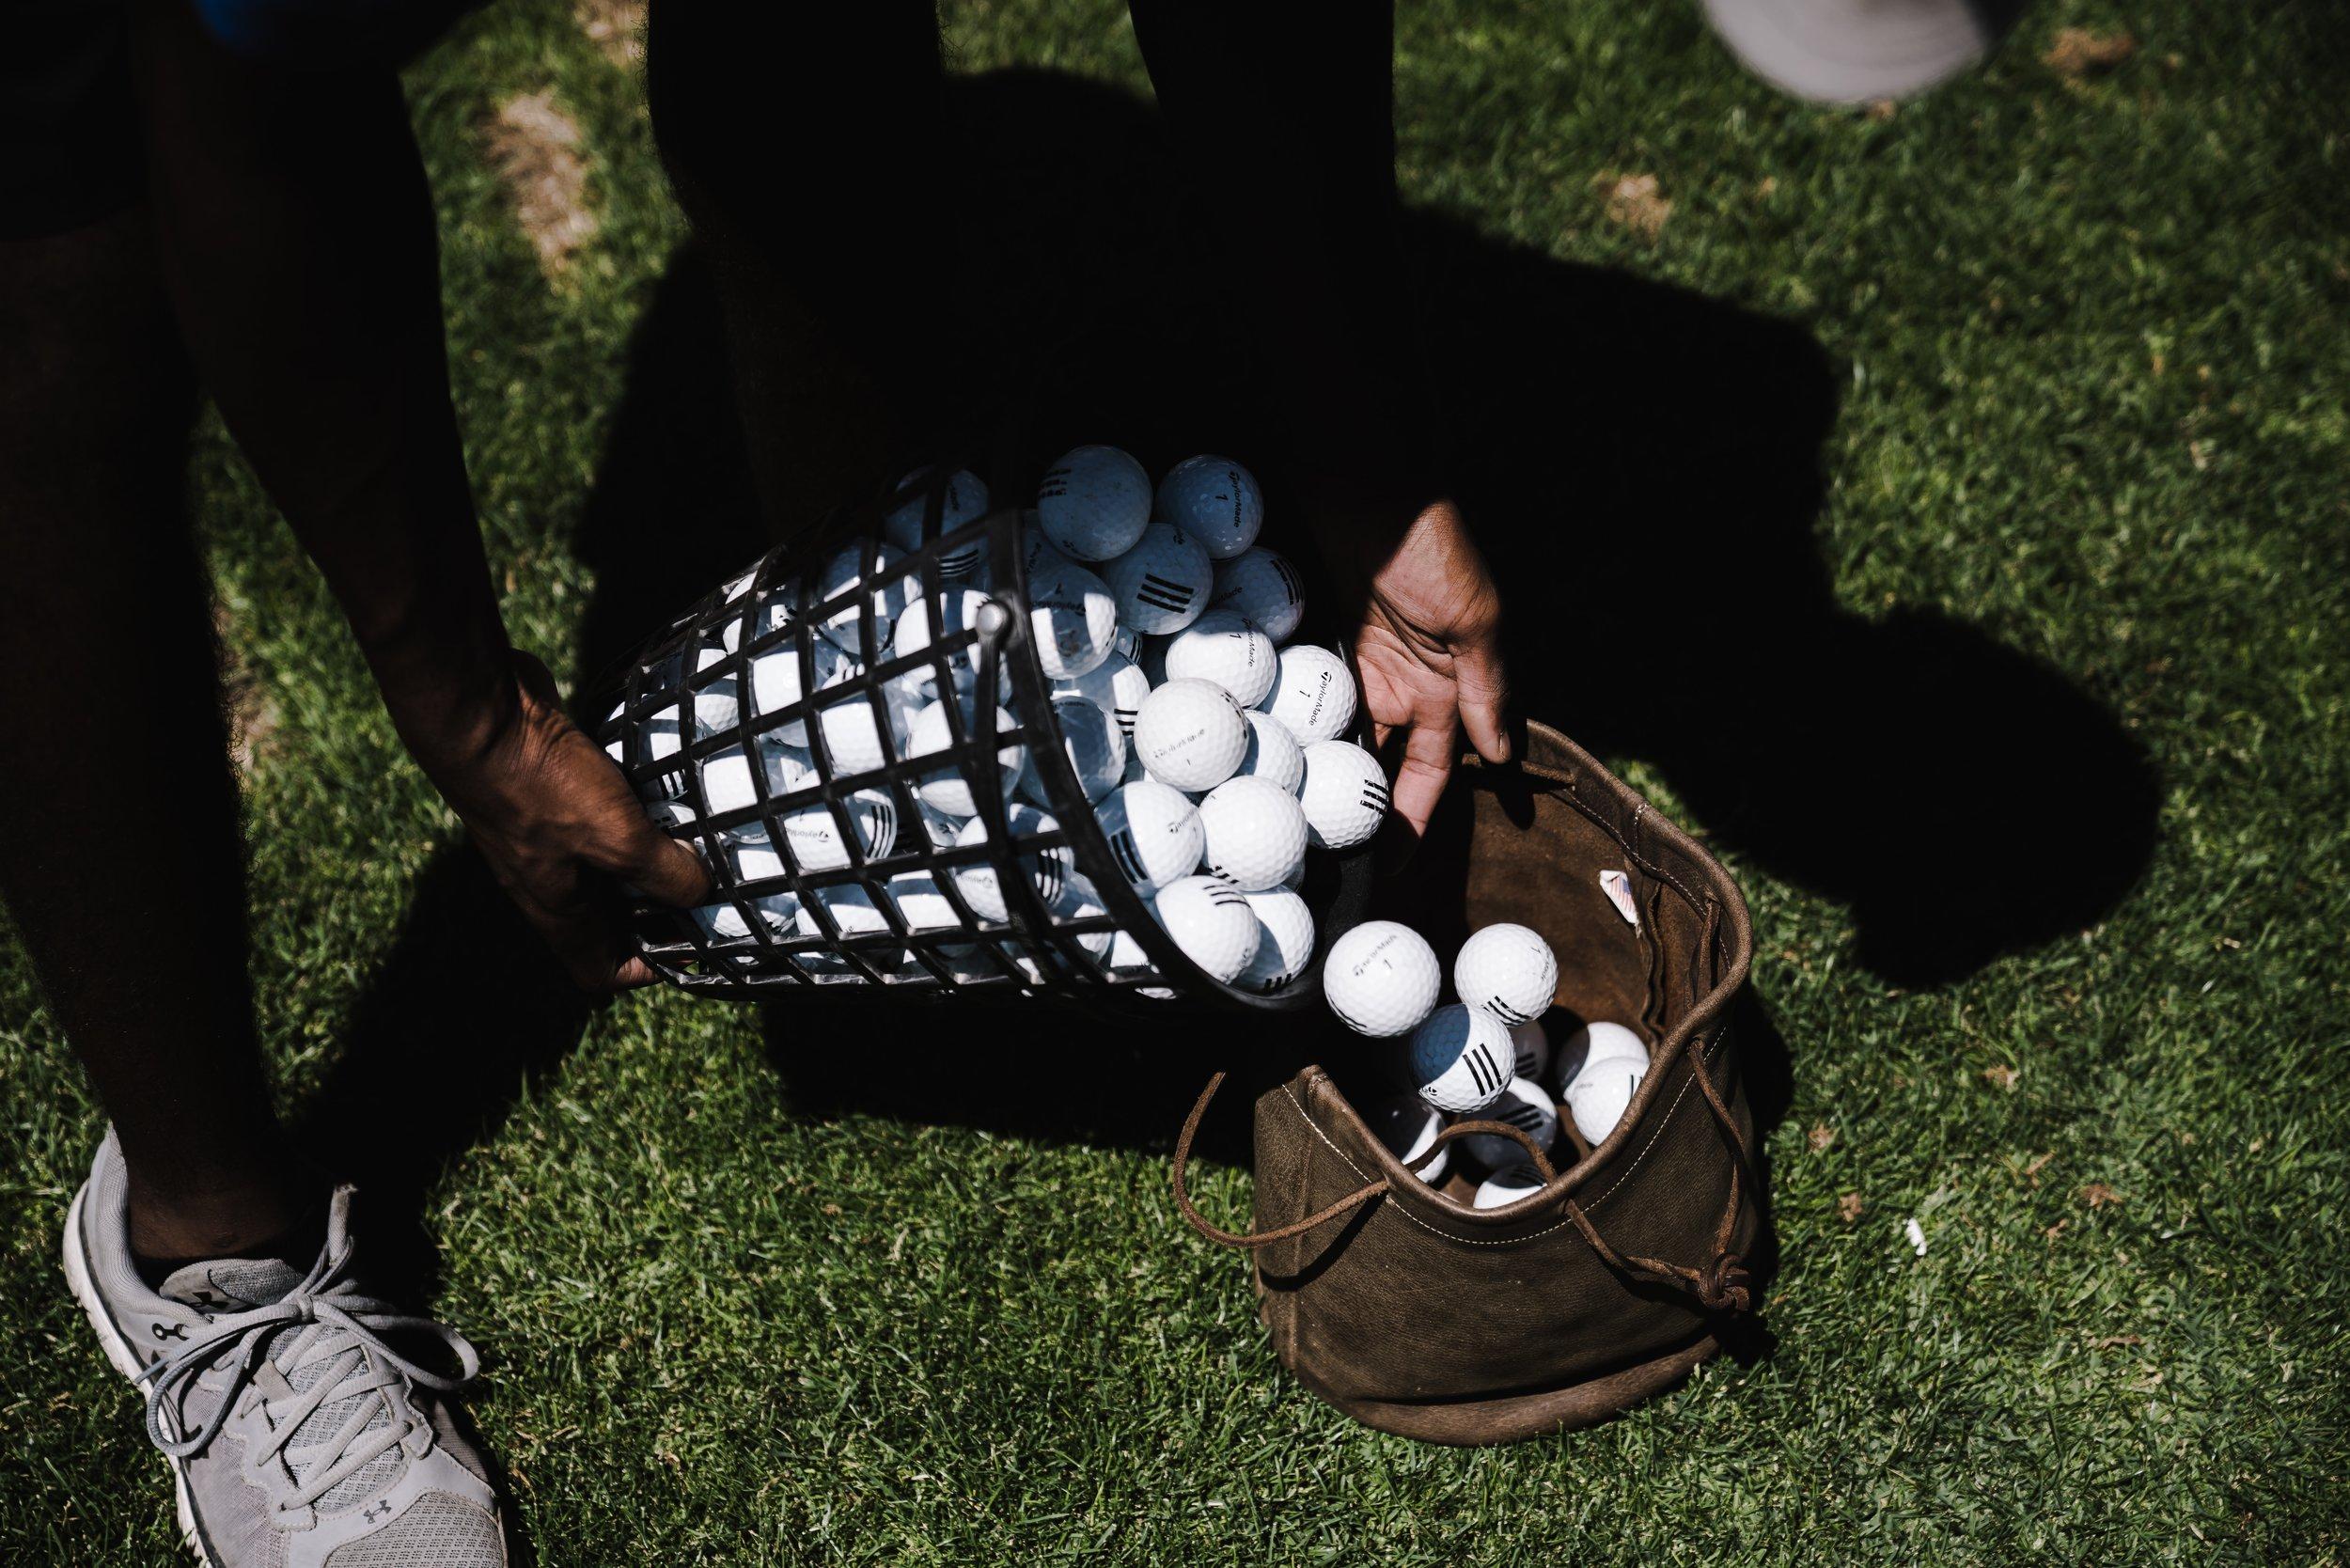 bag-balls-basket-1325733.jpg